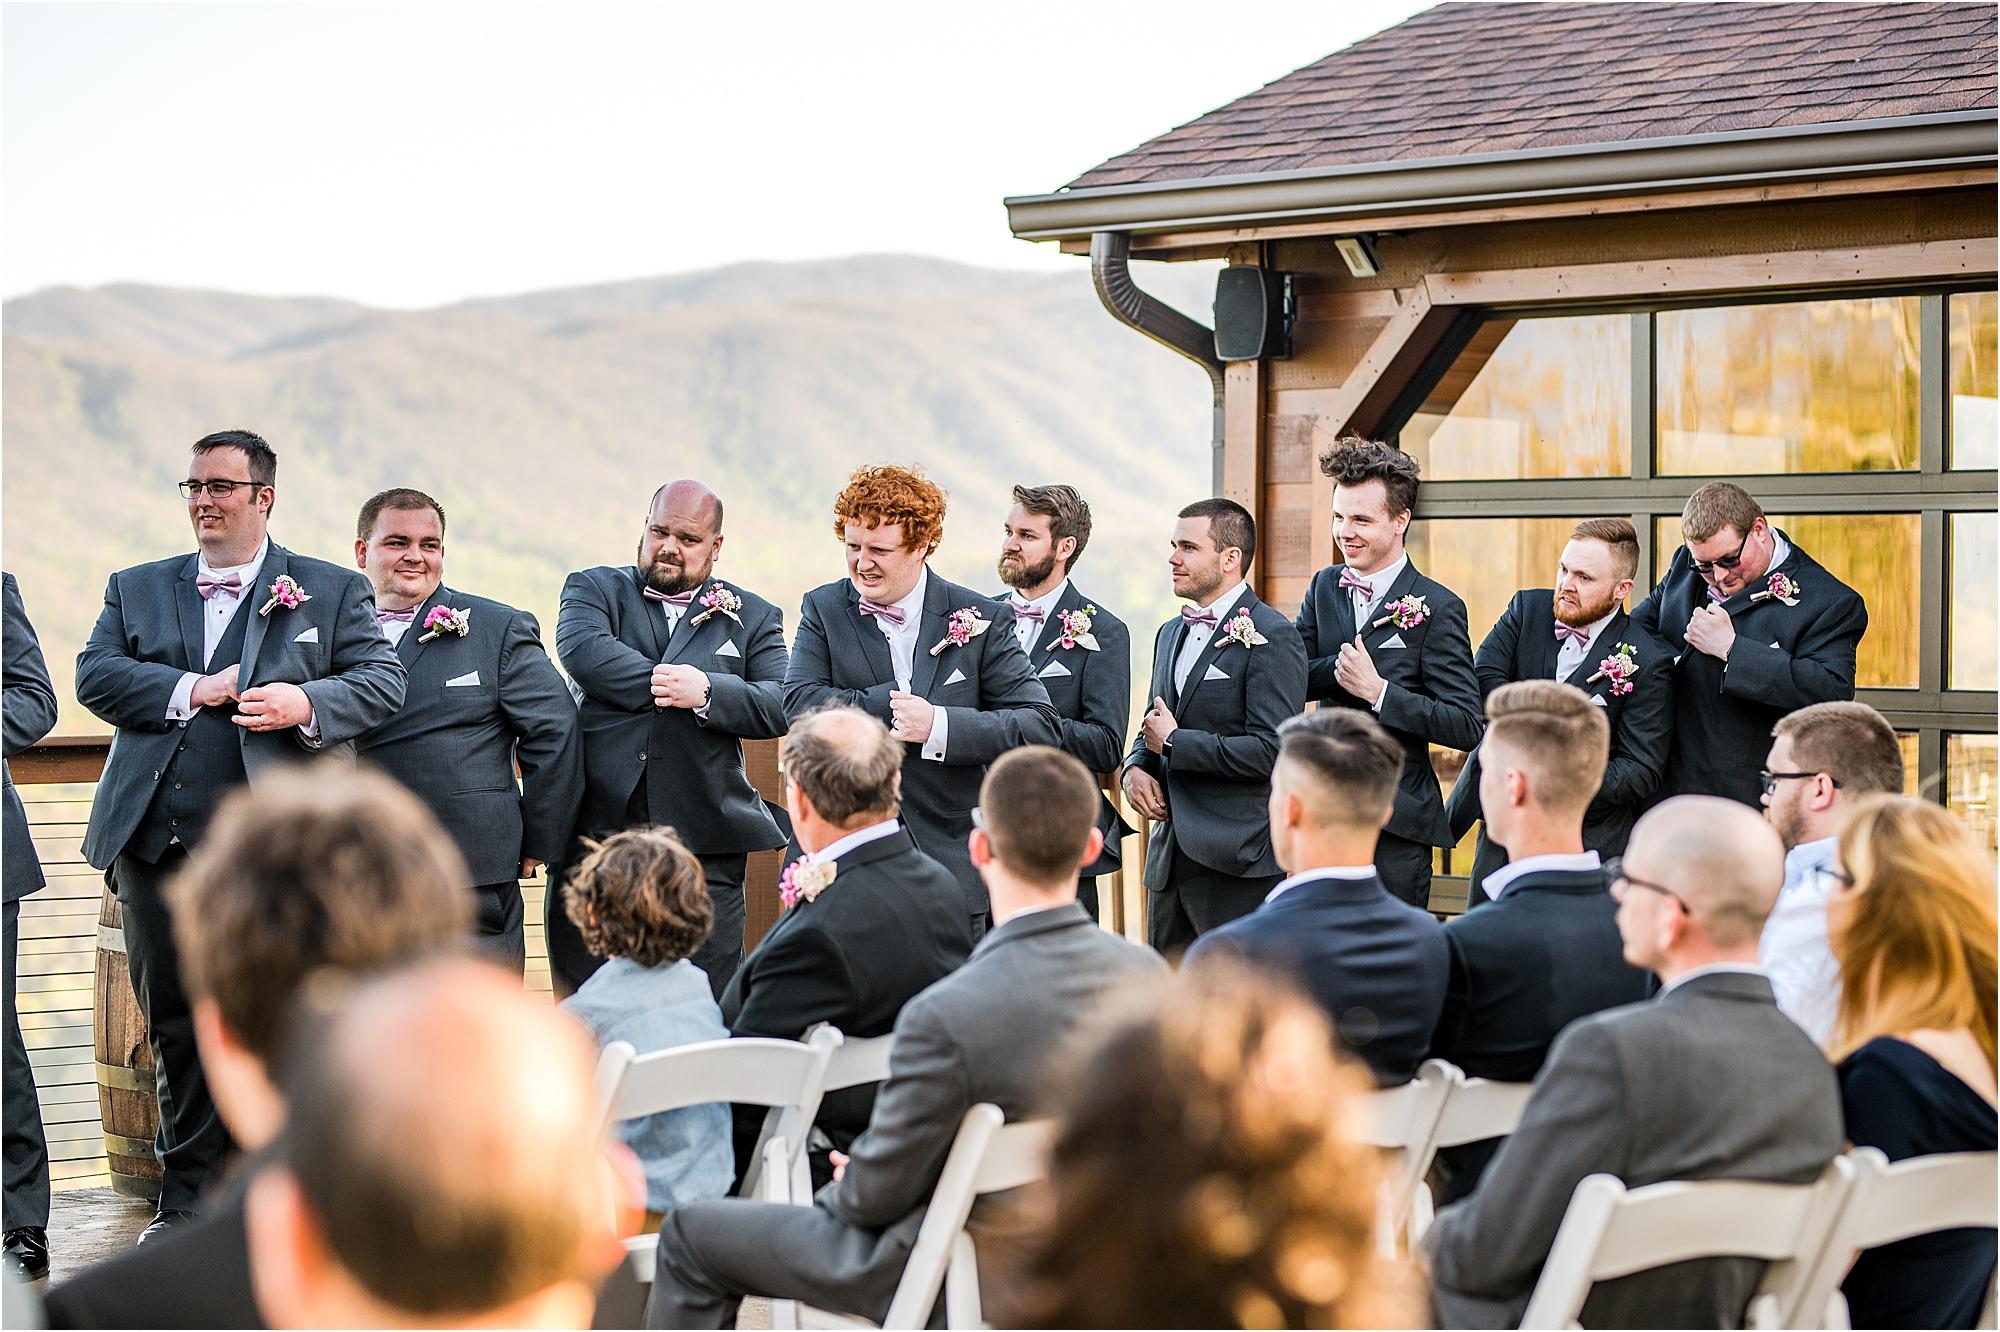 groomsmen trick at wedding ceremony